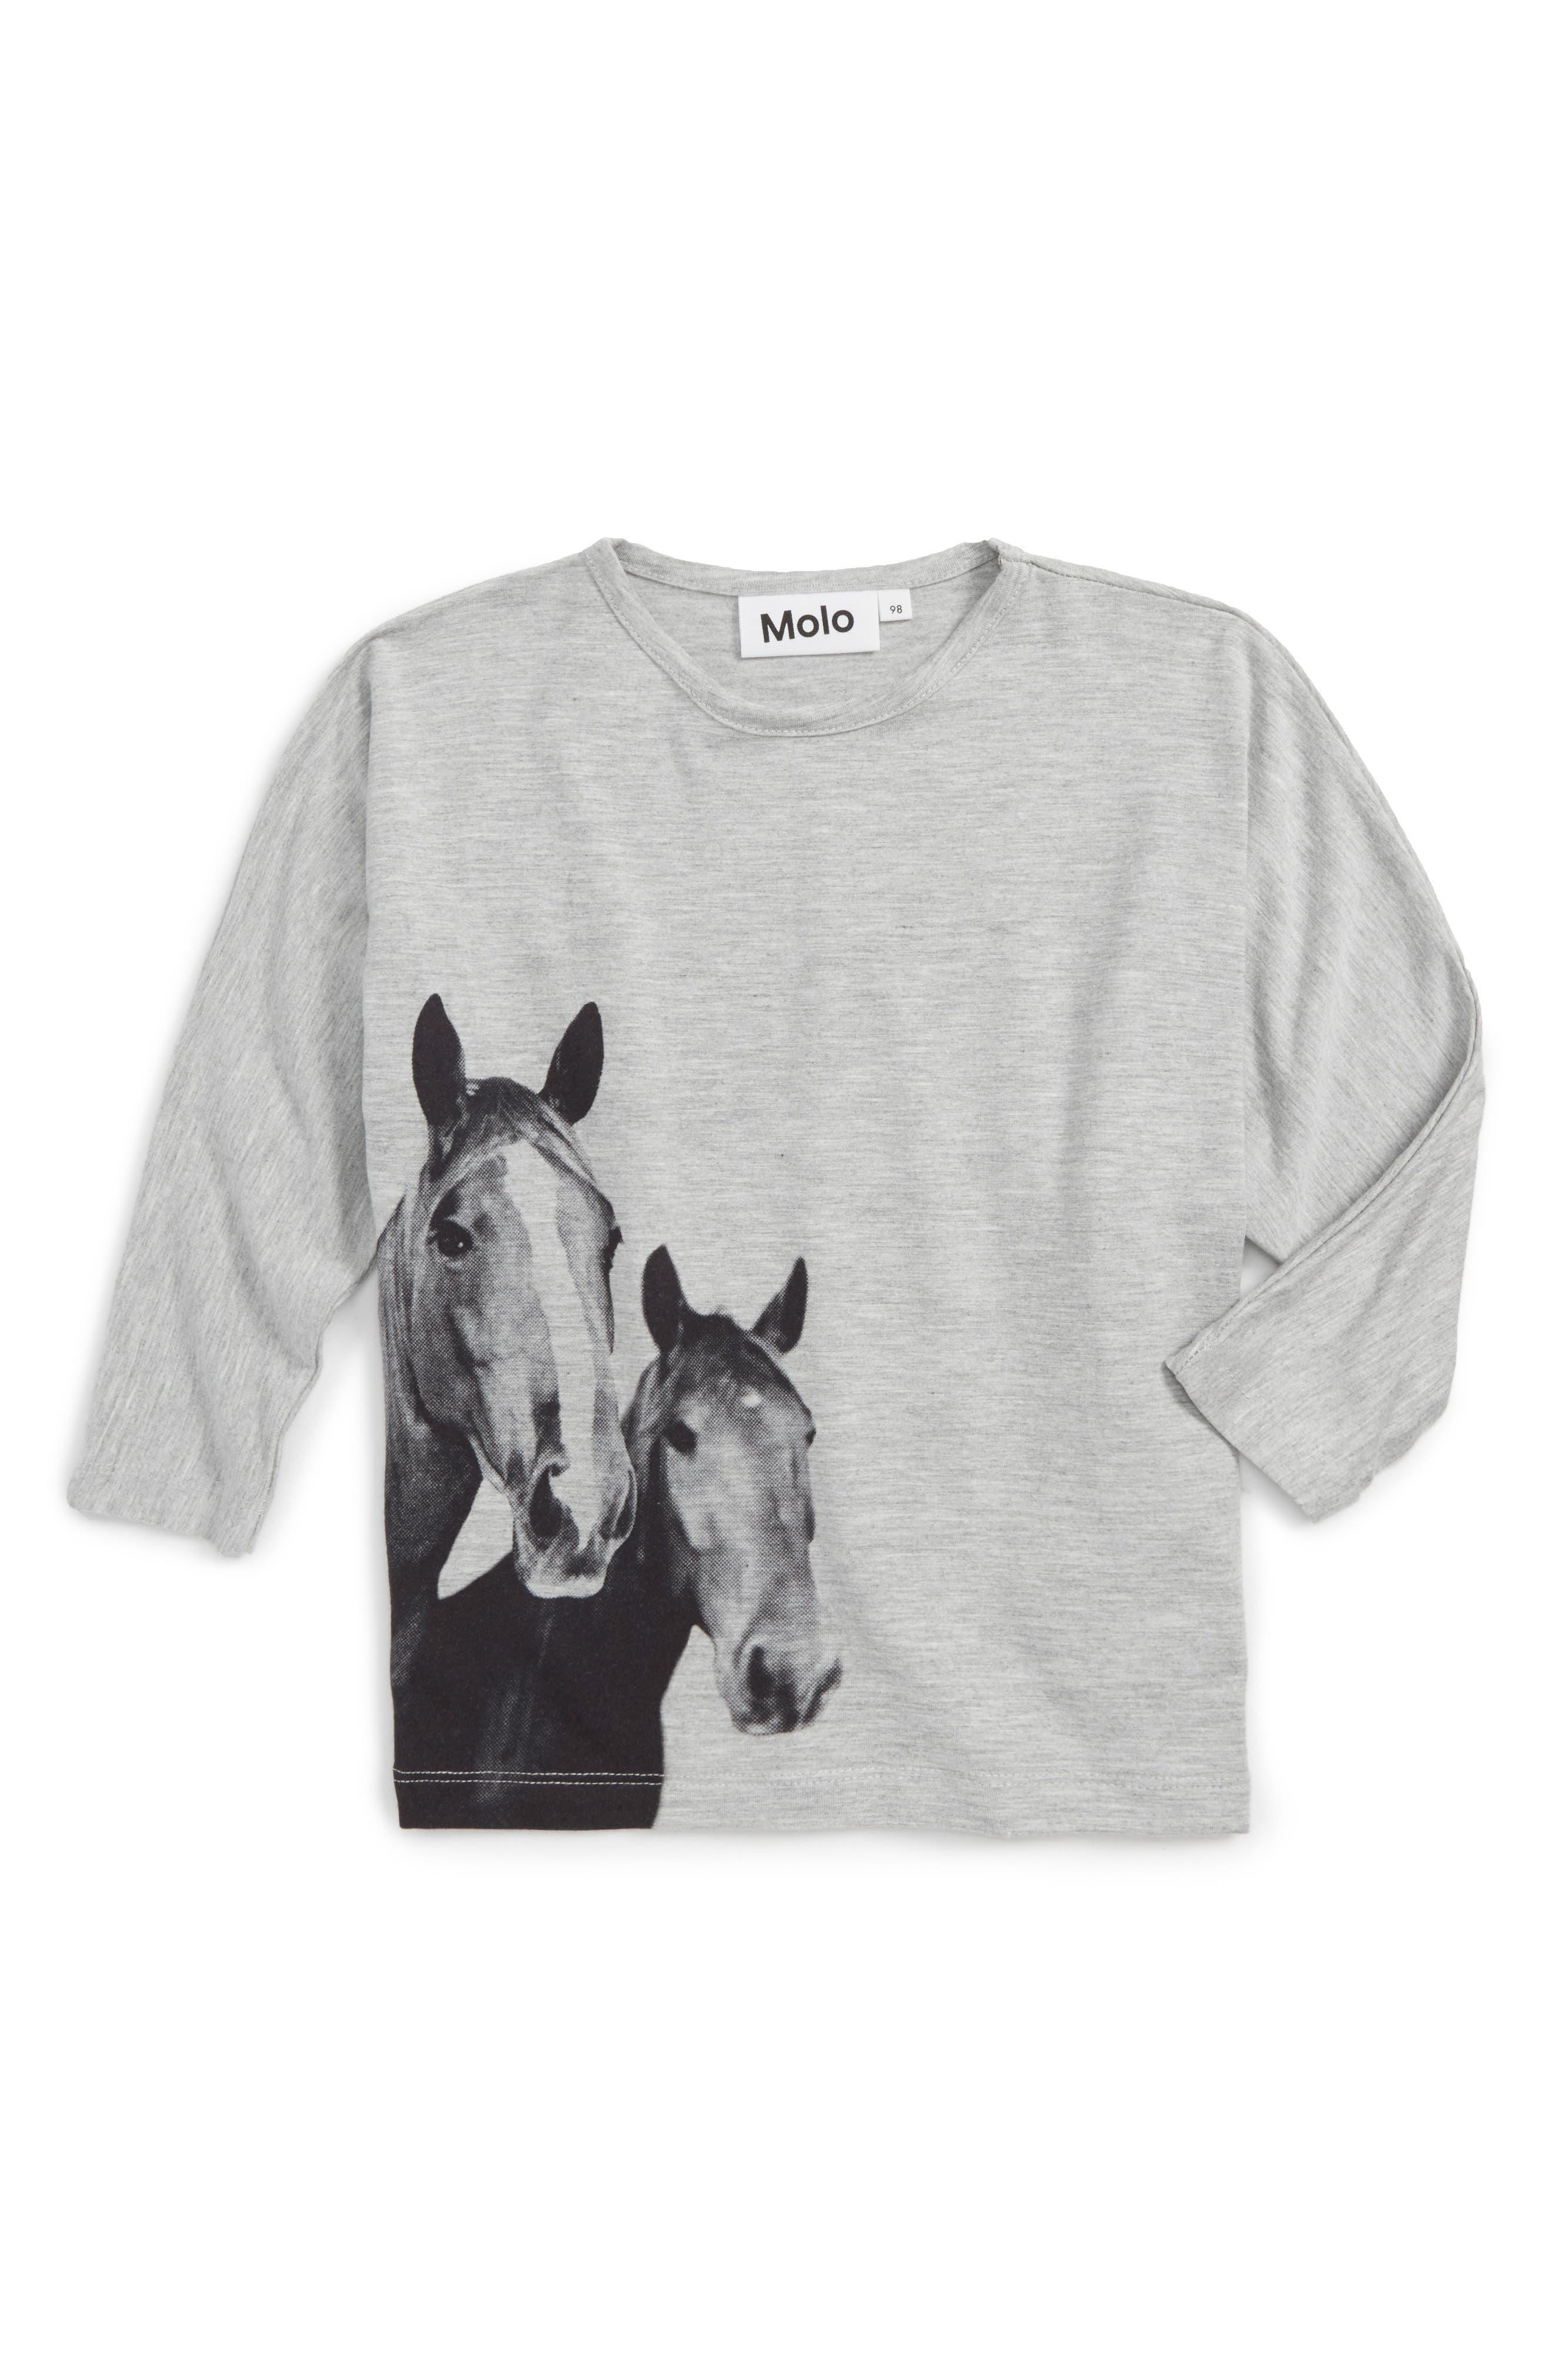 Molo Rosey Horse Graphic Tee (Toddler Girls, Little Girls & Big Girls)